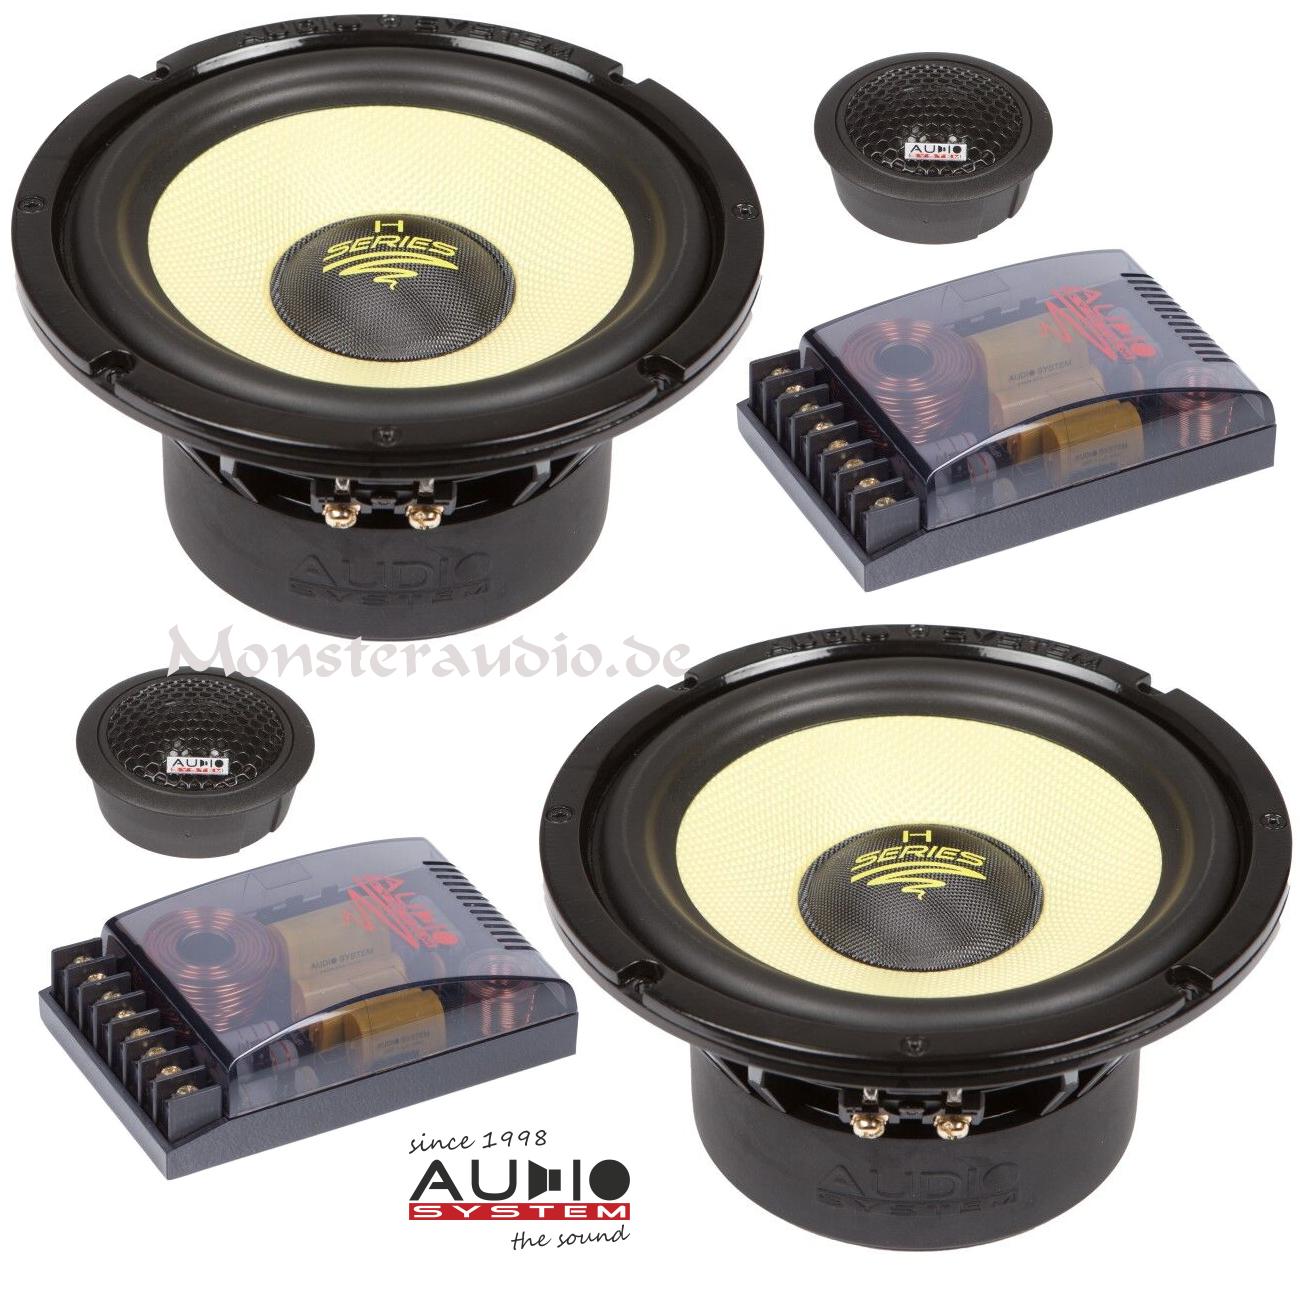 monsteraudio audio system h 165 16 5cm 2 wege. Black Bedroom Furniture Sets. Home Design Ideas